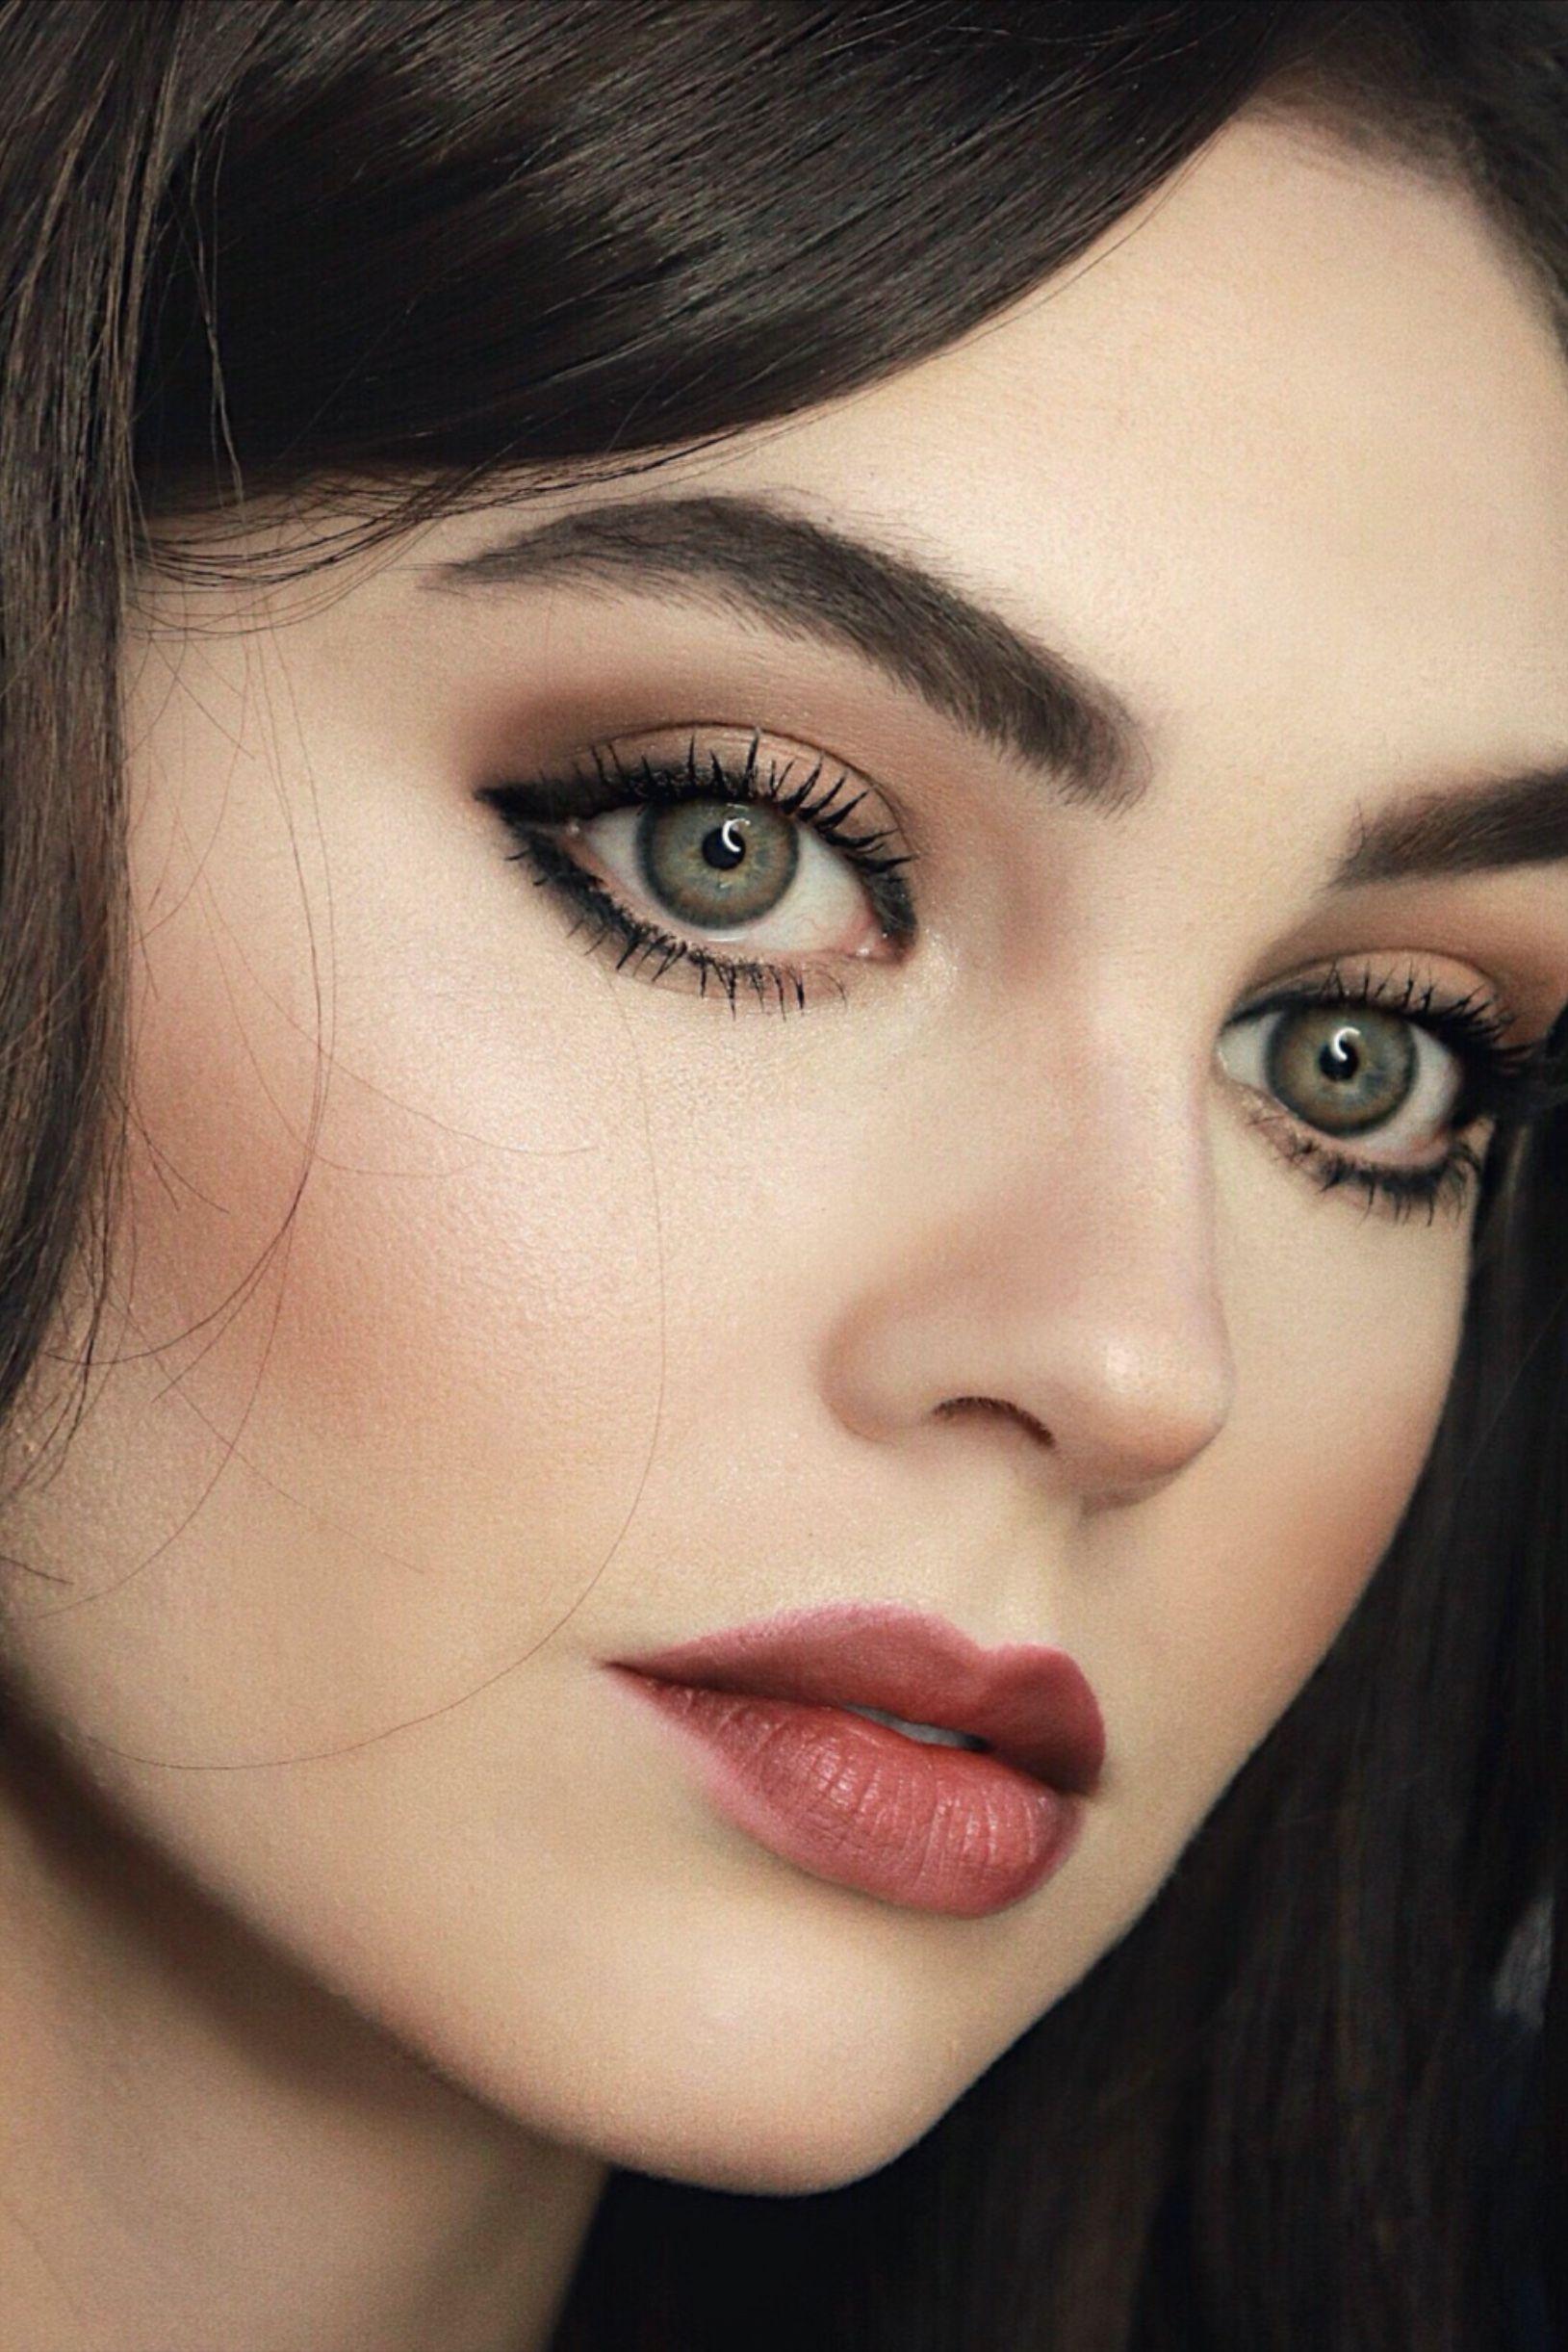 Aria Montgomery Pretty Little Liars Vampy Makeup In 2020 Vampy Makeup Pretty Little Liars Aria Pretty Little Liars